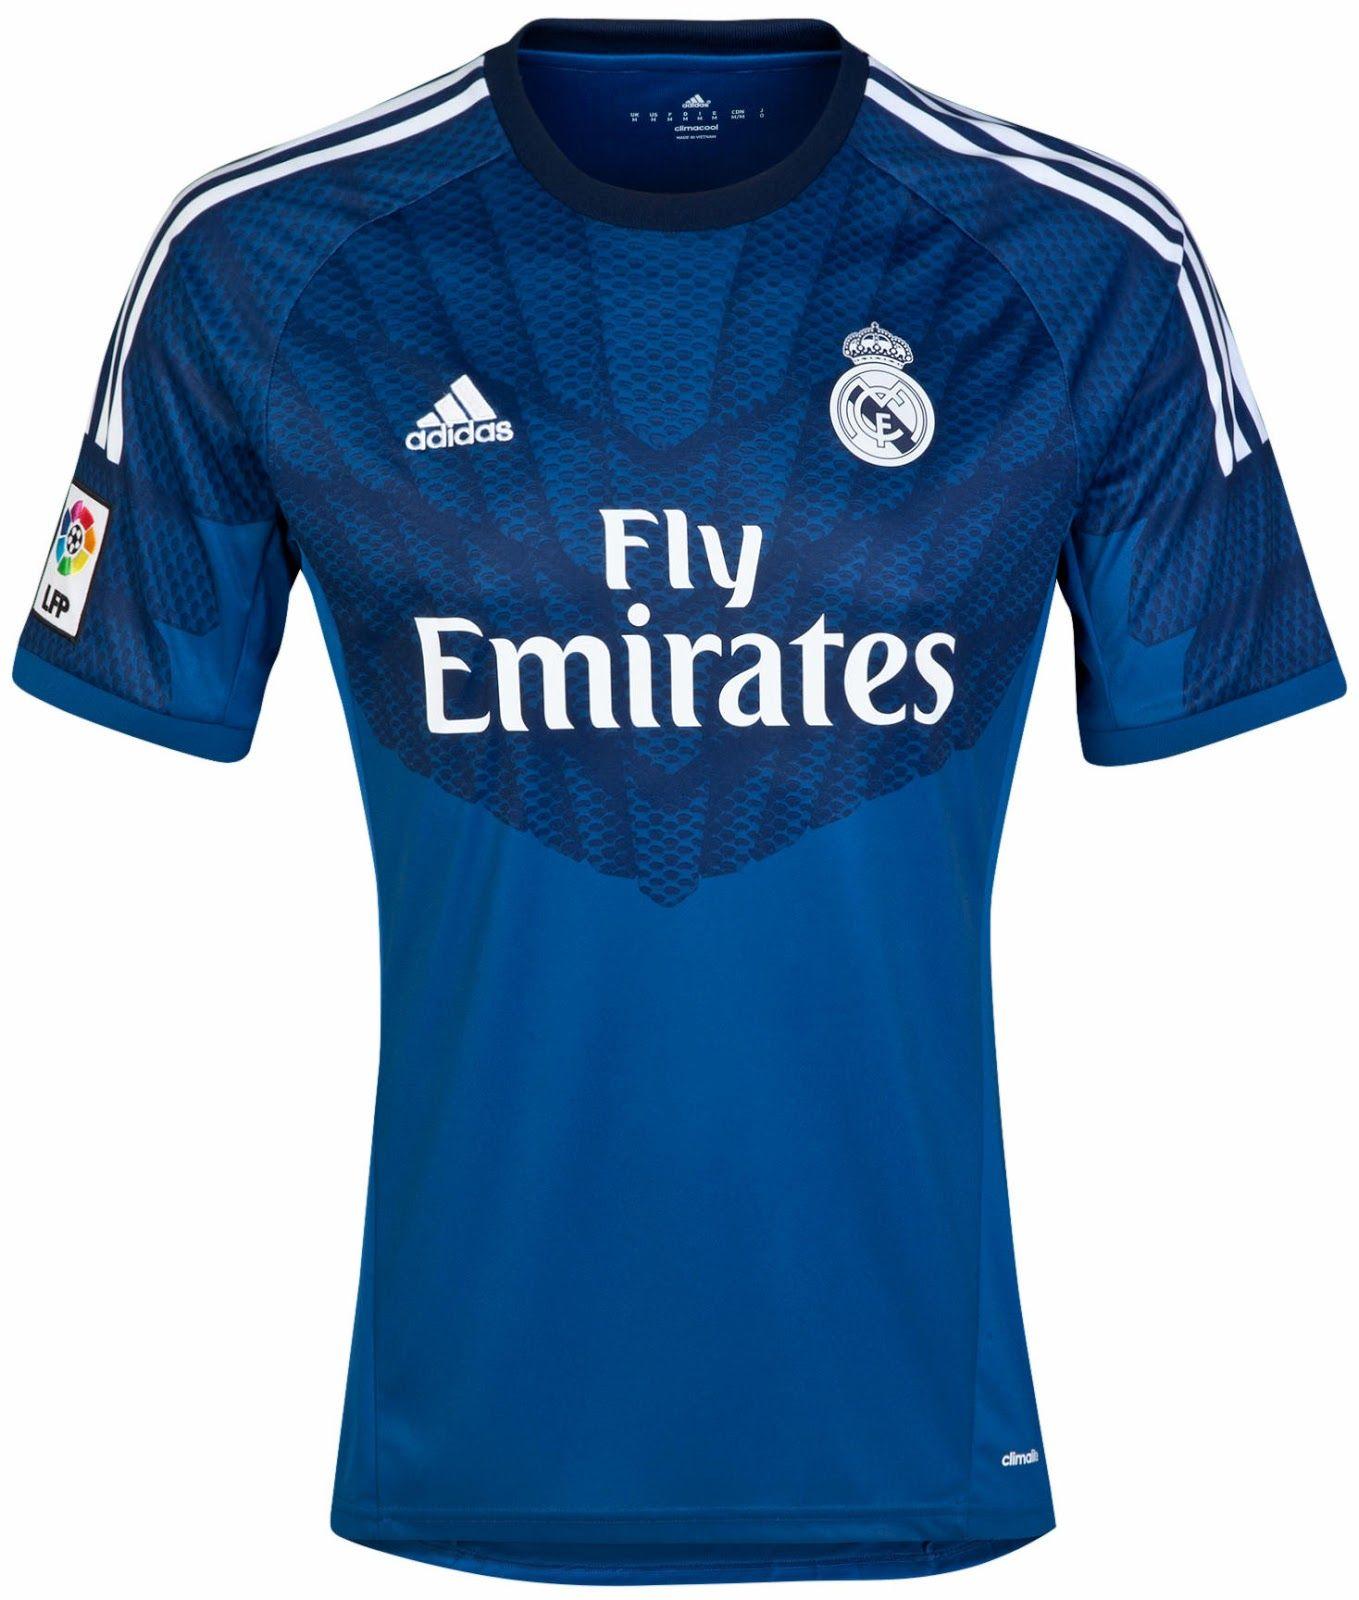 Real Madrid CF Camisas De Futbol ba201ace698d6